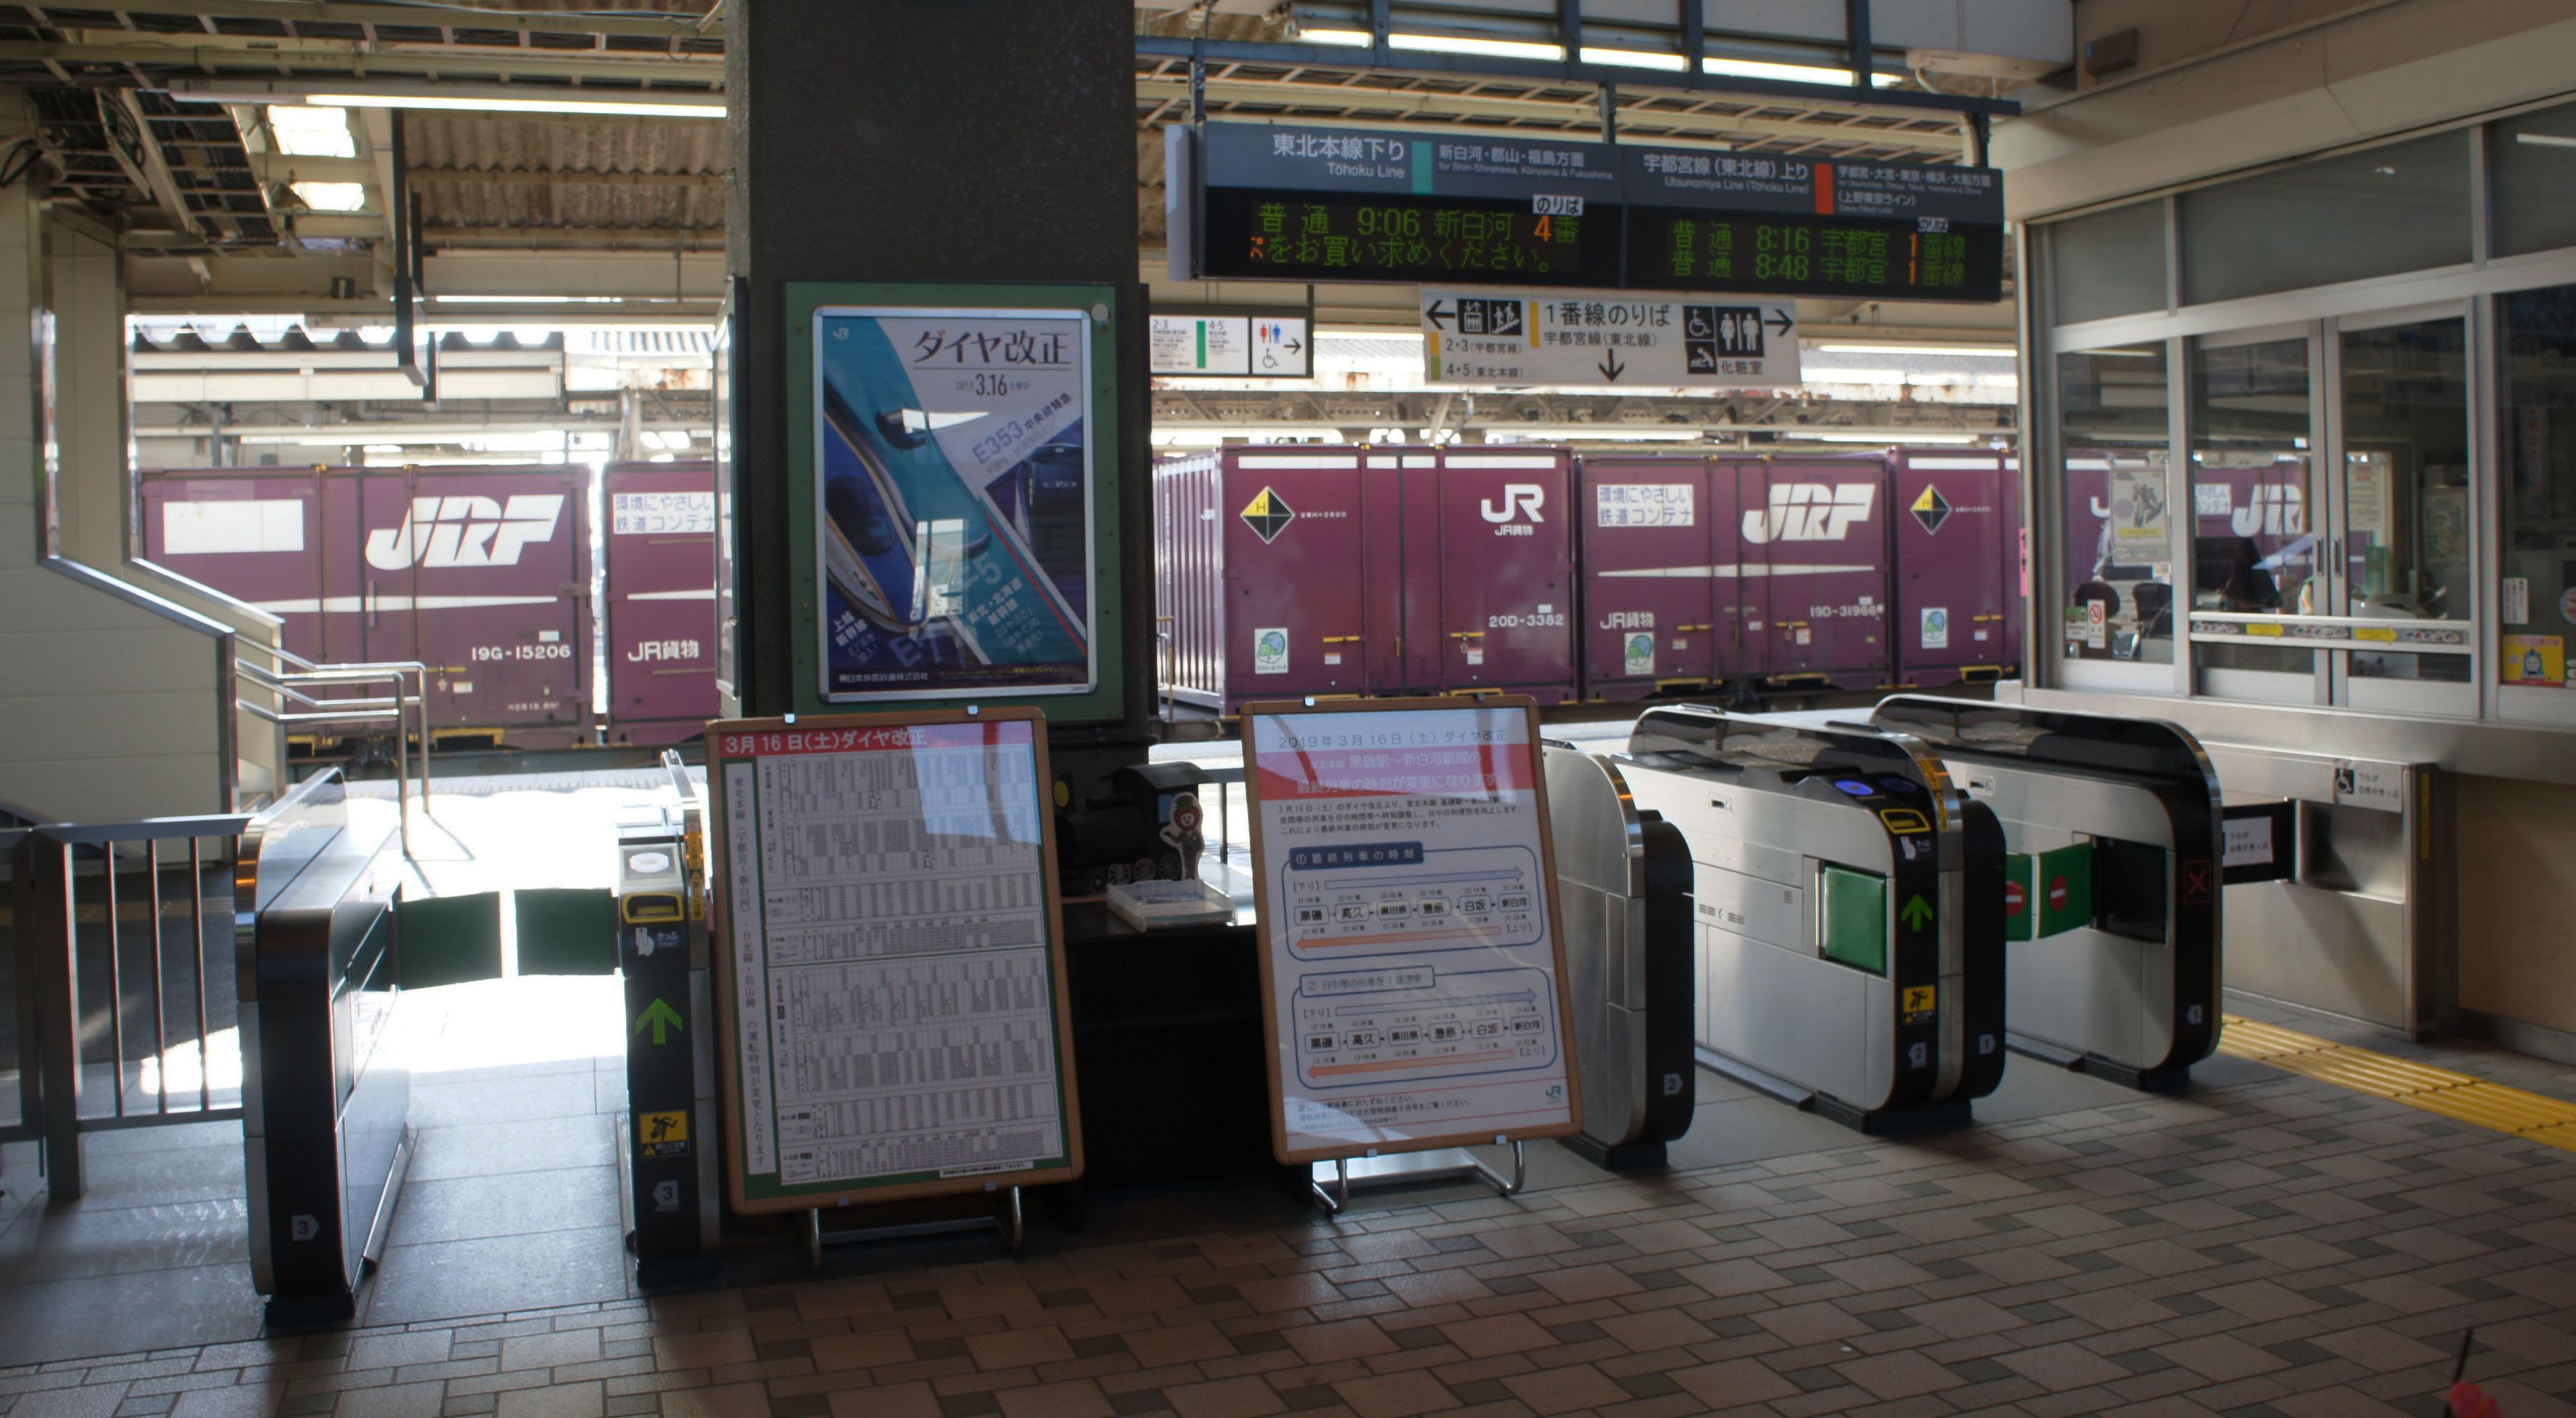 https://upload.wikimedia.org/wikipedia/commons/4/40/JR_Tohoku-Main-Line_Kuroiso_Station_Gates.jpg